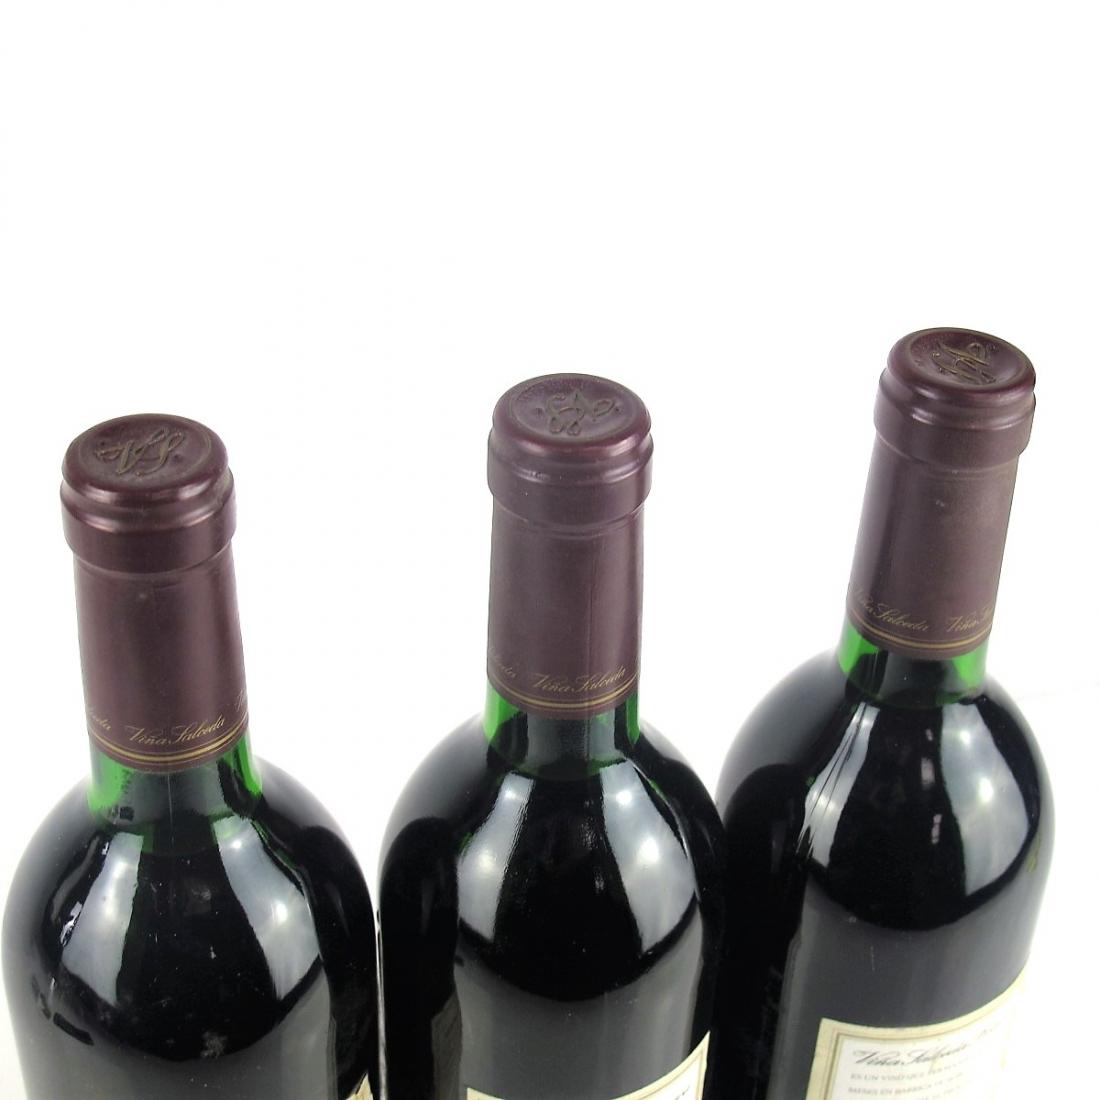 Viña Salceda 1989 Rioja Reserva 3x75cl